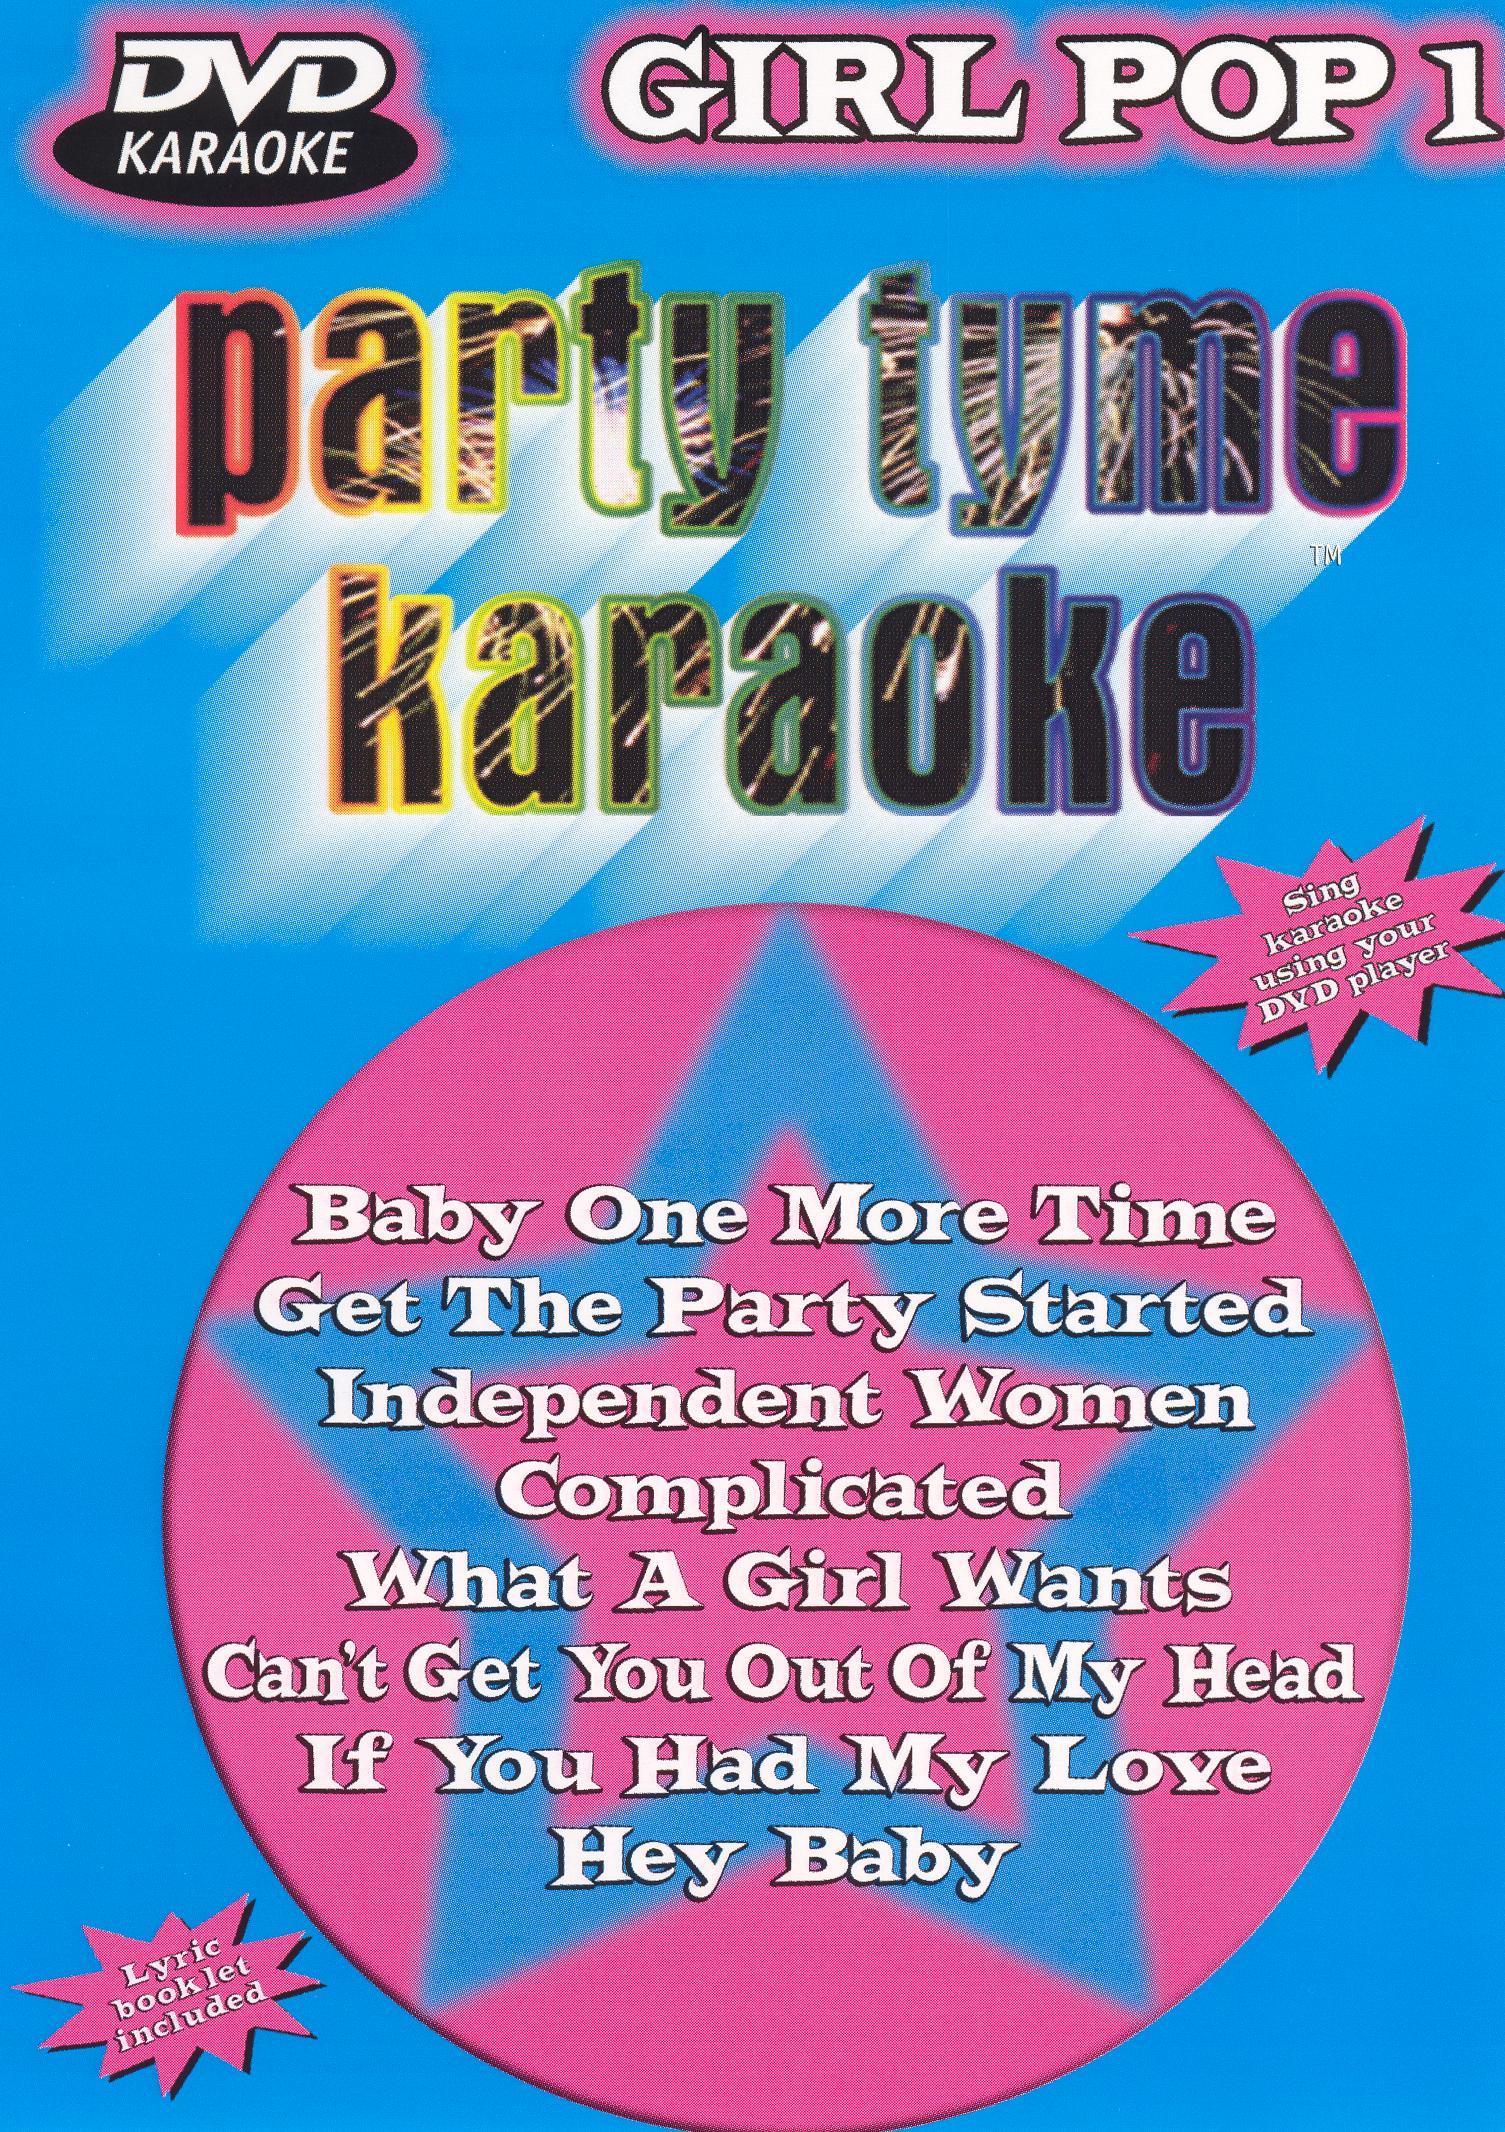 Party Tyme Karaoke: Girl Pop, Vol. 1